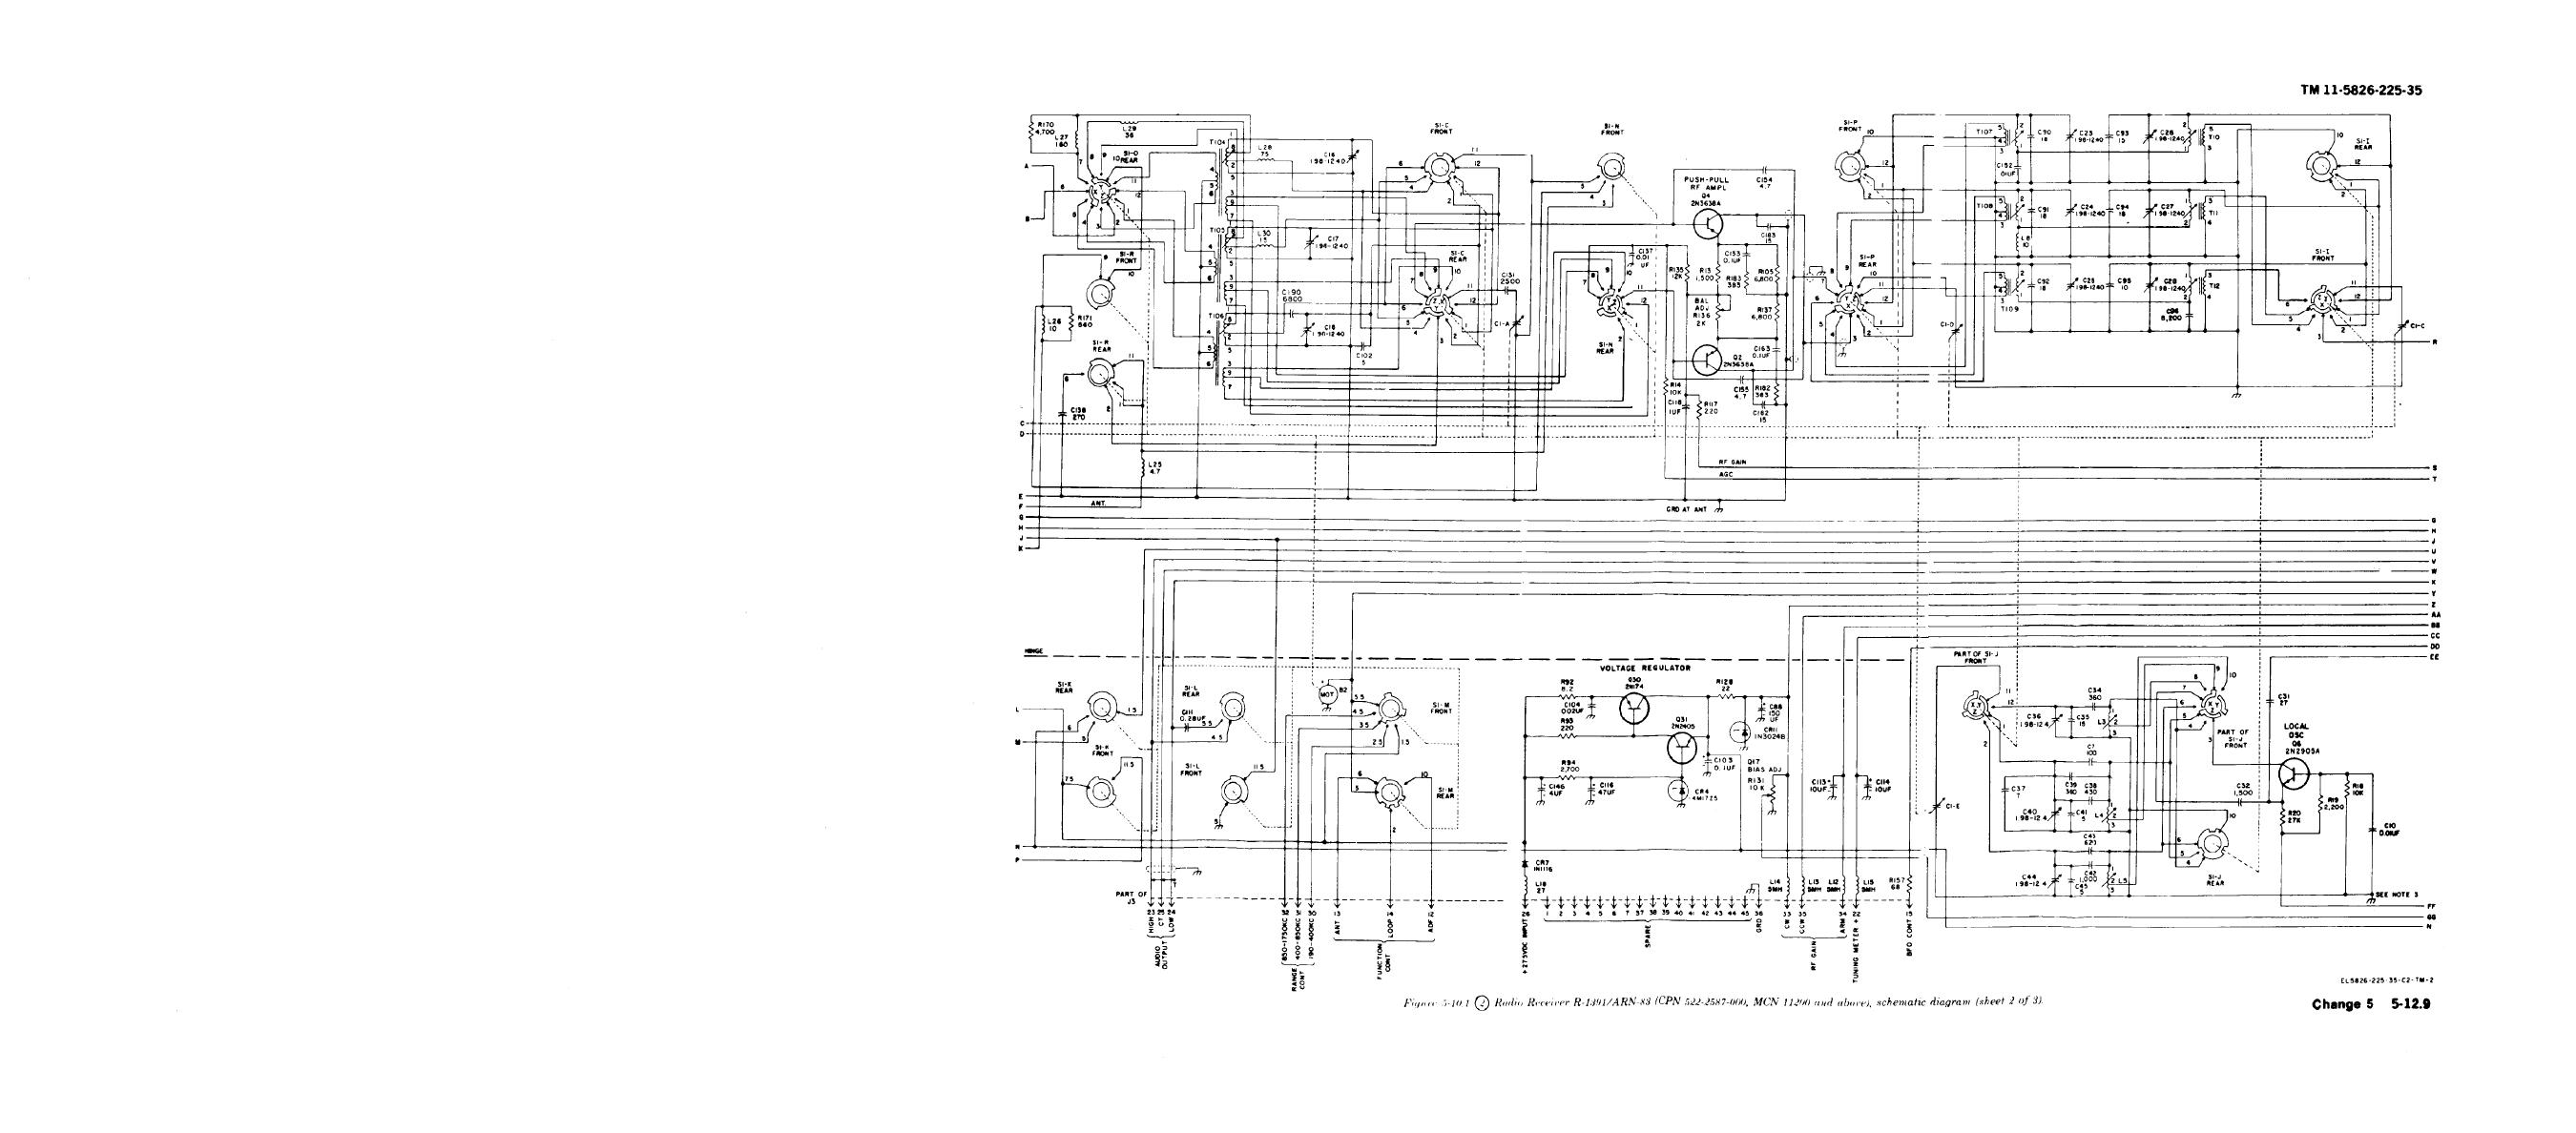 Figure 5 10 1 Radio Receiver Schematic Diagram Sheet 2